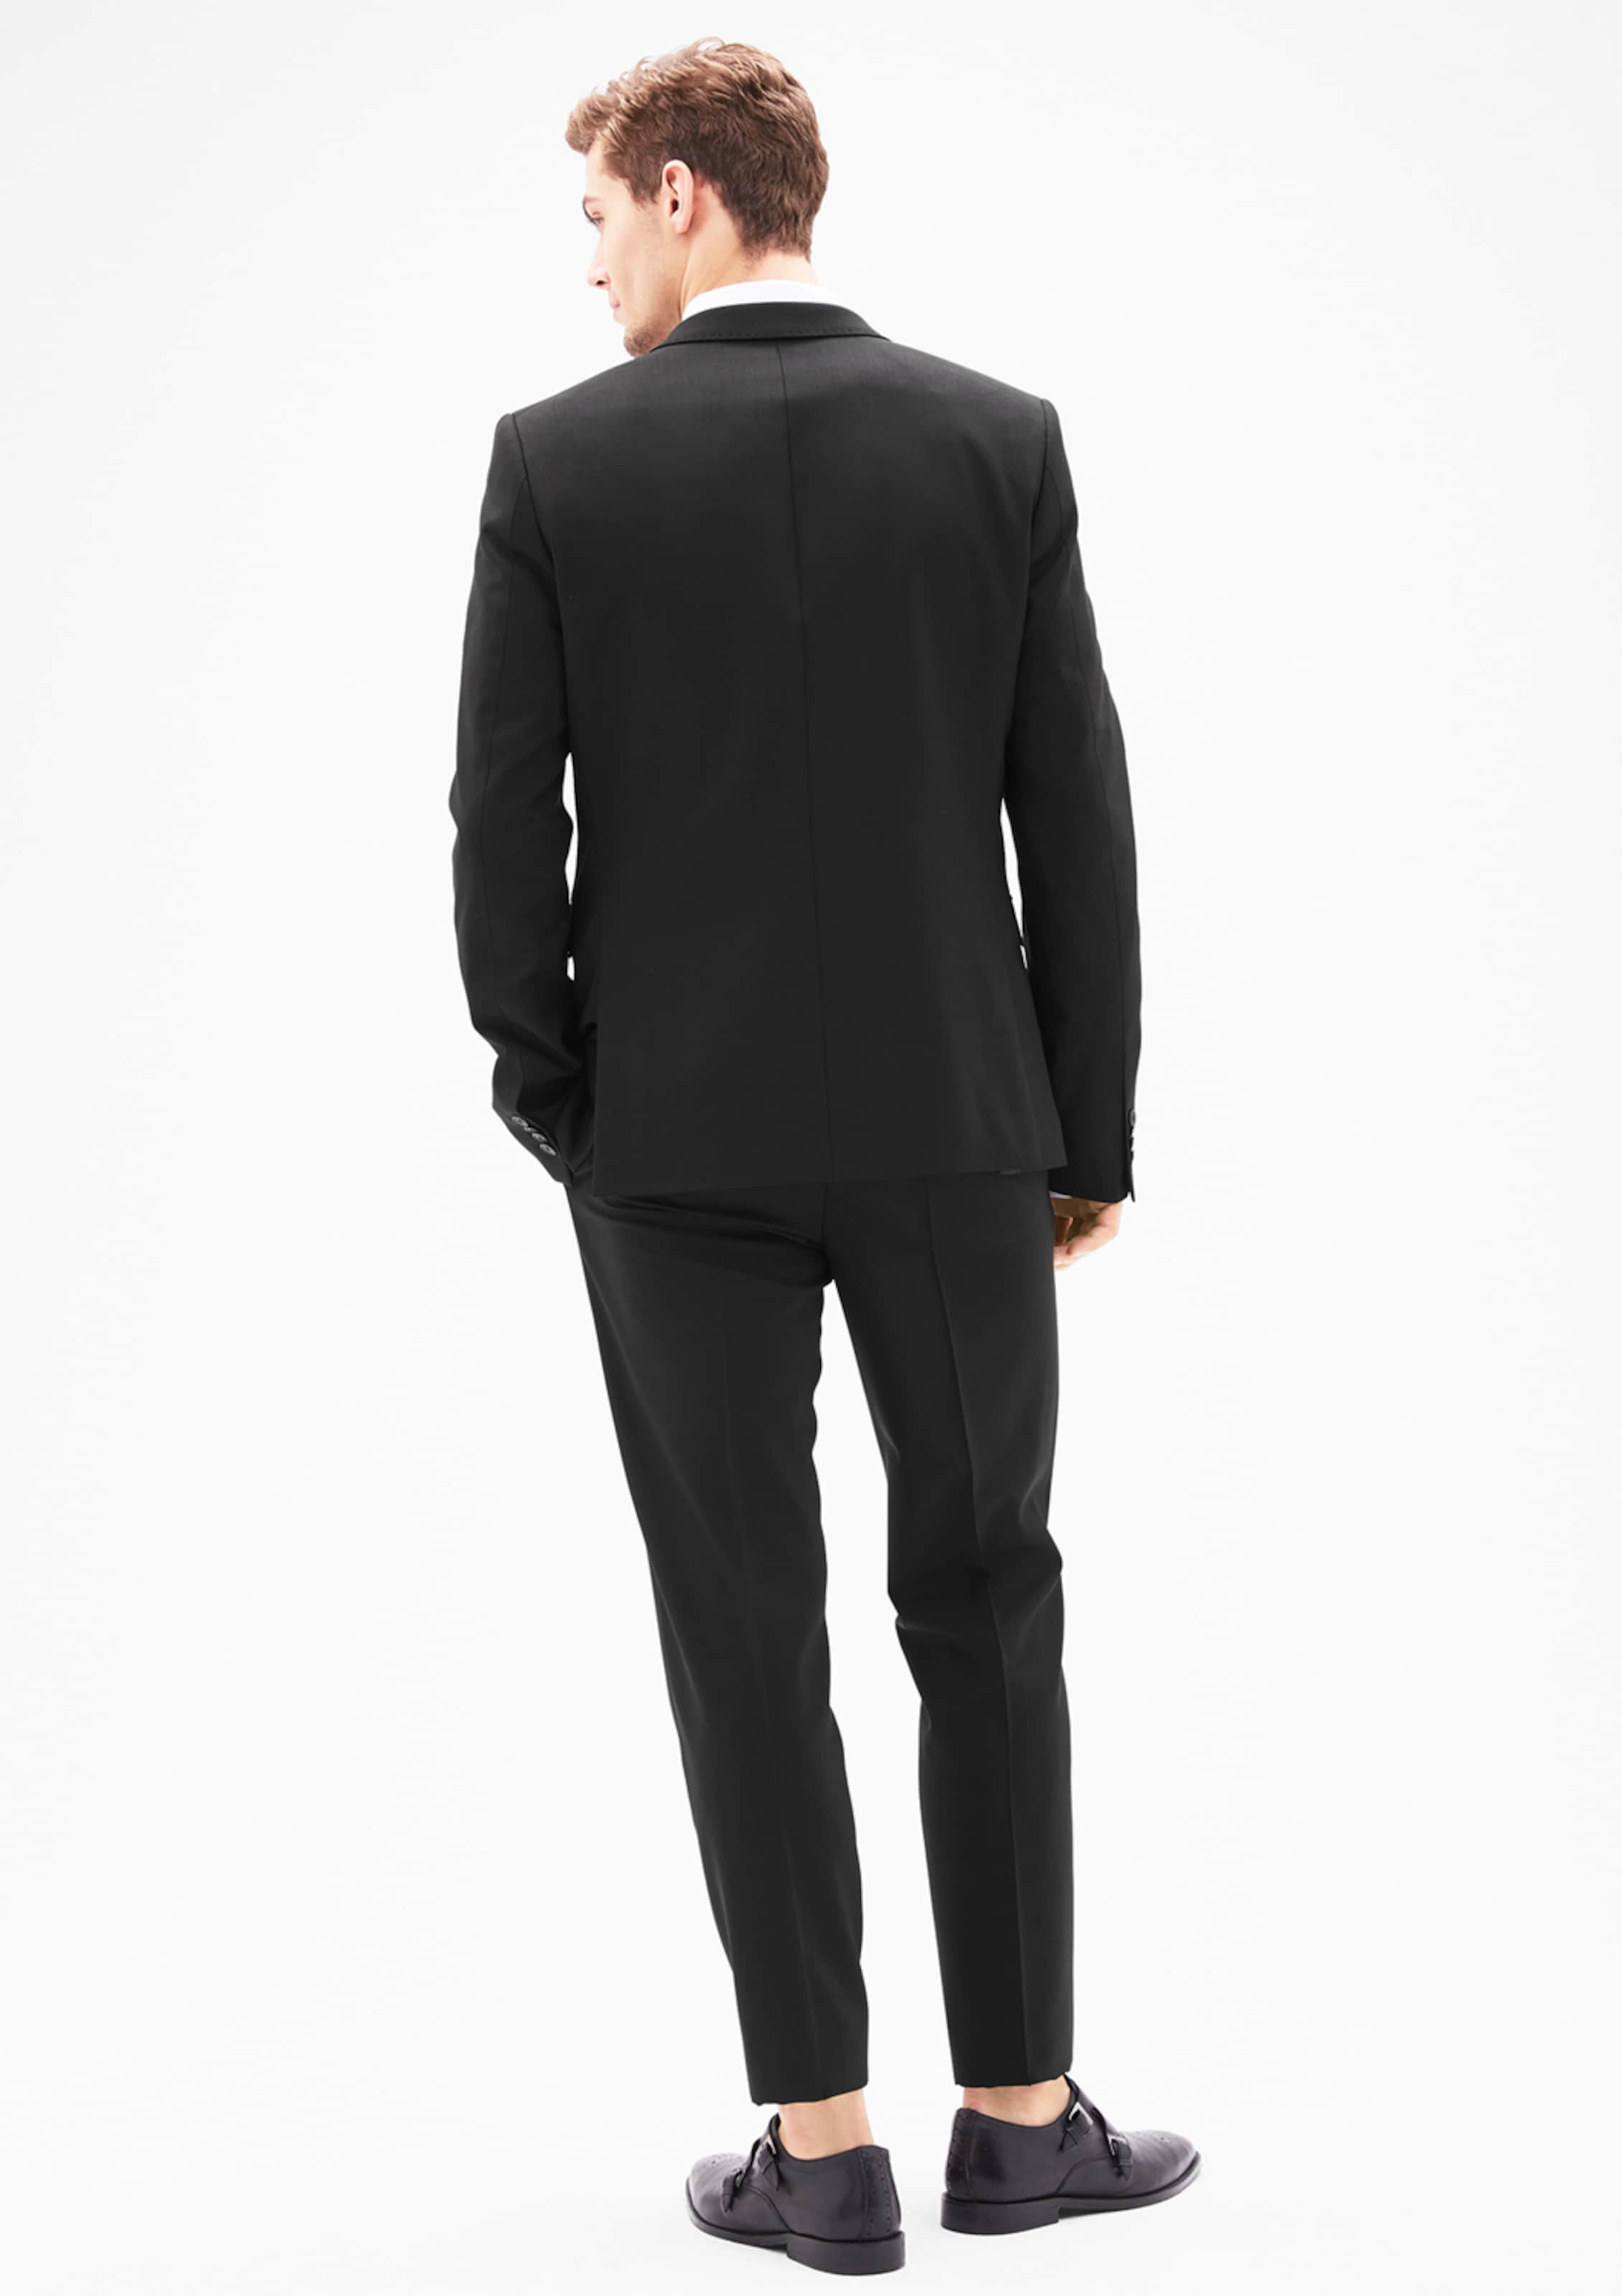 s.Oliver BLACK LABEL Cosimo Slim Flex: Sakko mit Struktur Neue Stile Finish Auslass Truhe Ebay 1qeKsFaYR